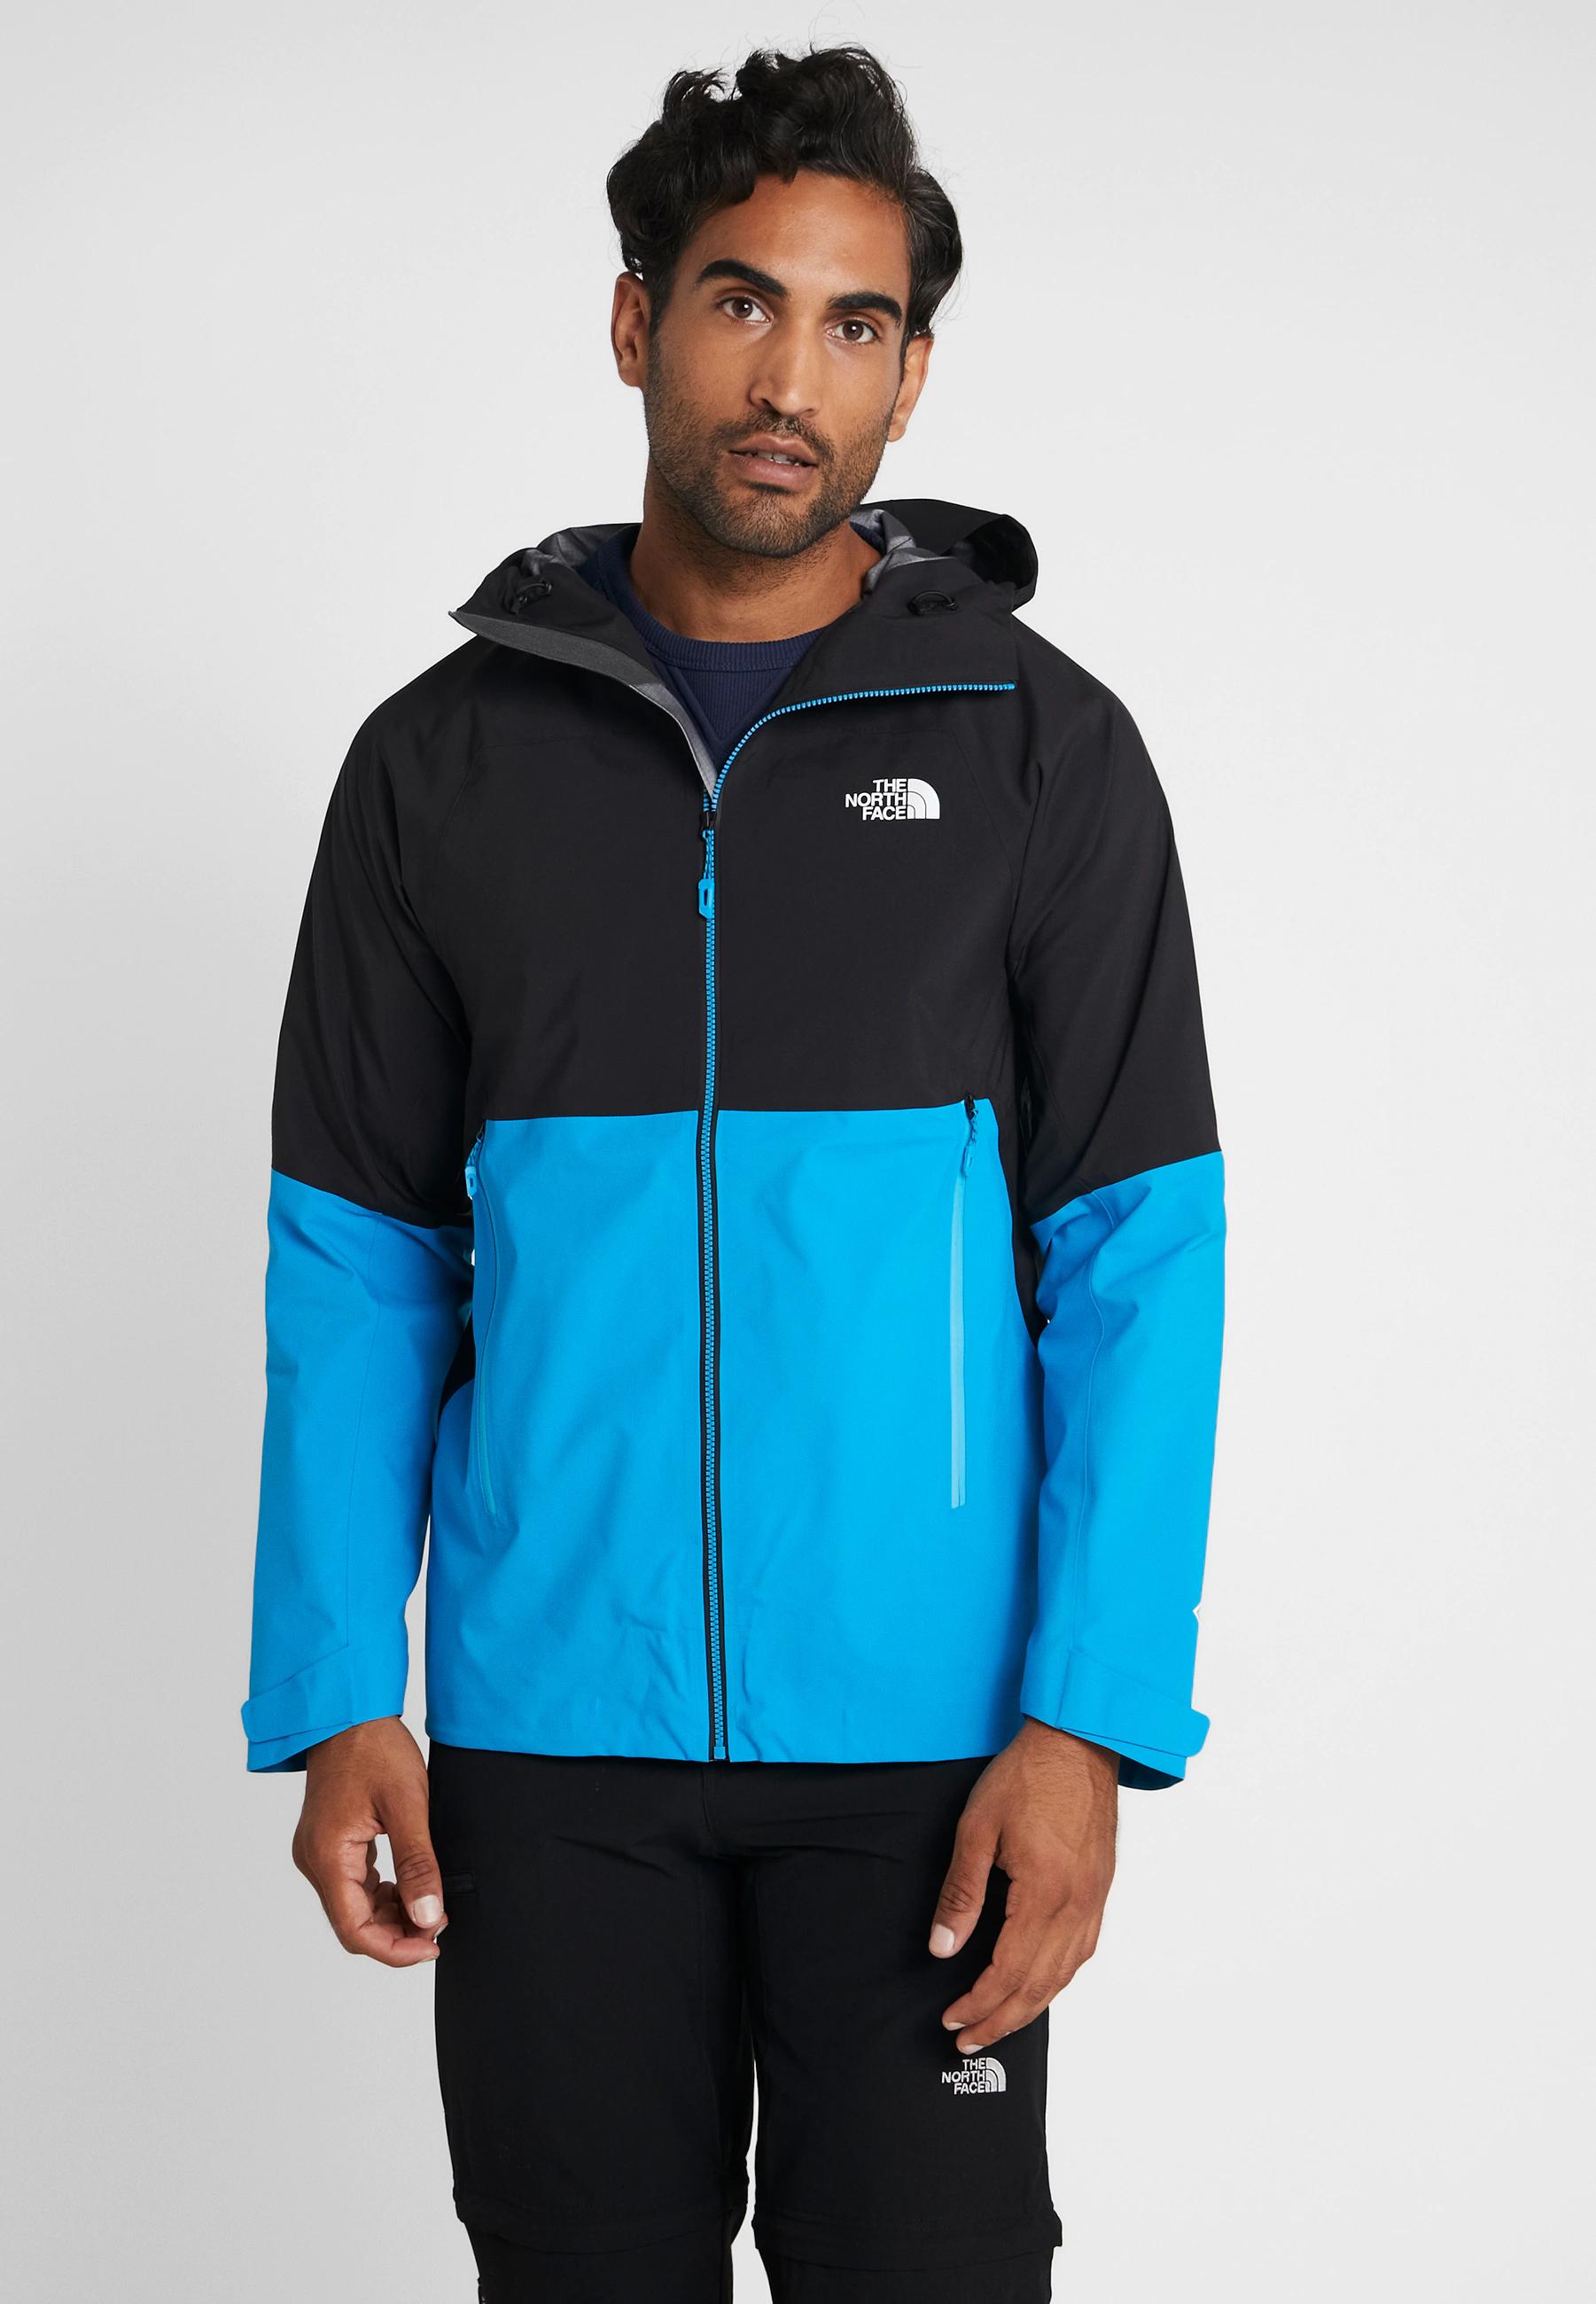 The North Face Men's GORE-TEX Pro Impendor Shell Jacket £105 @ Zalando